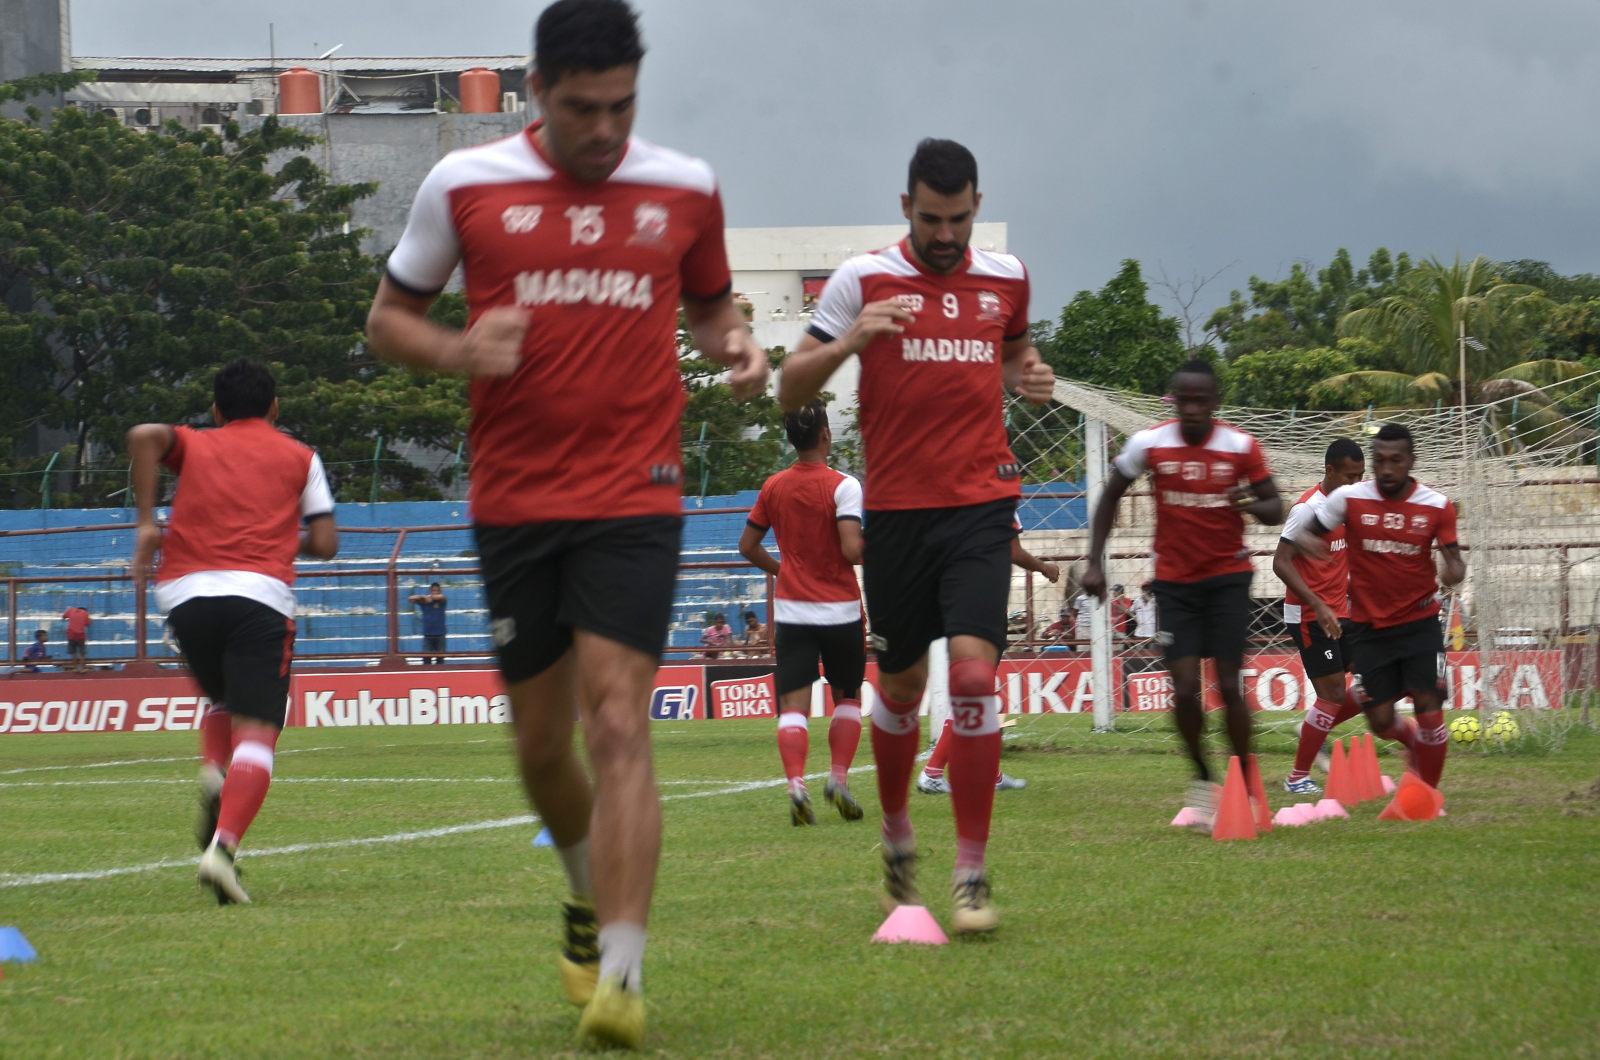 Jadwal Liga 1 2017 Hari Ini, Madura United vs PS TNI